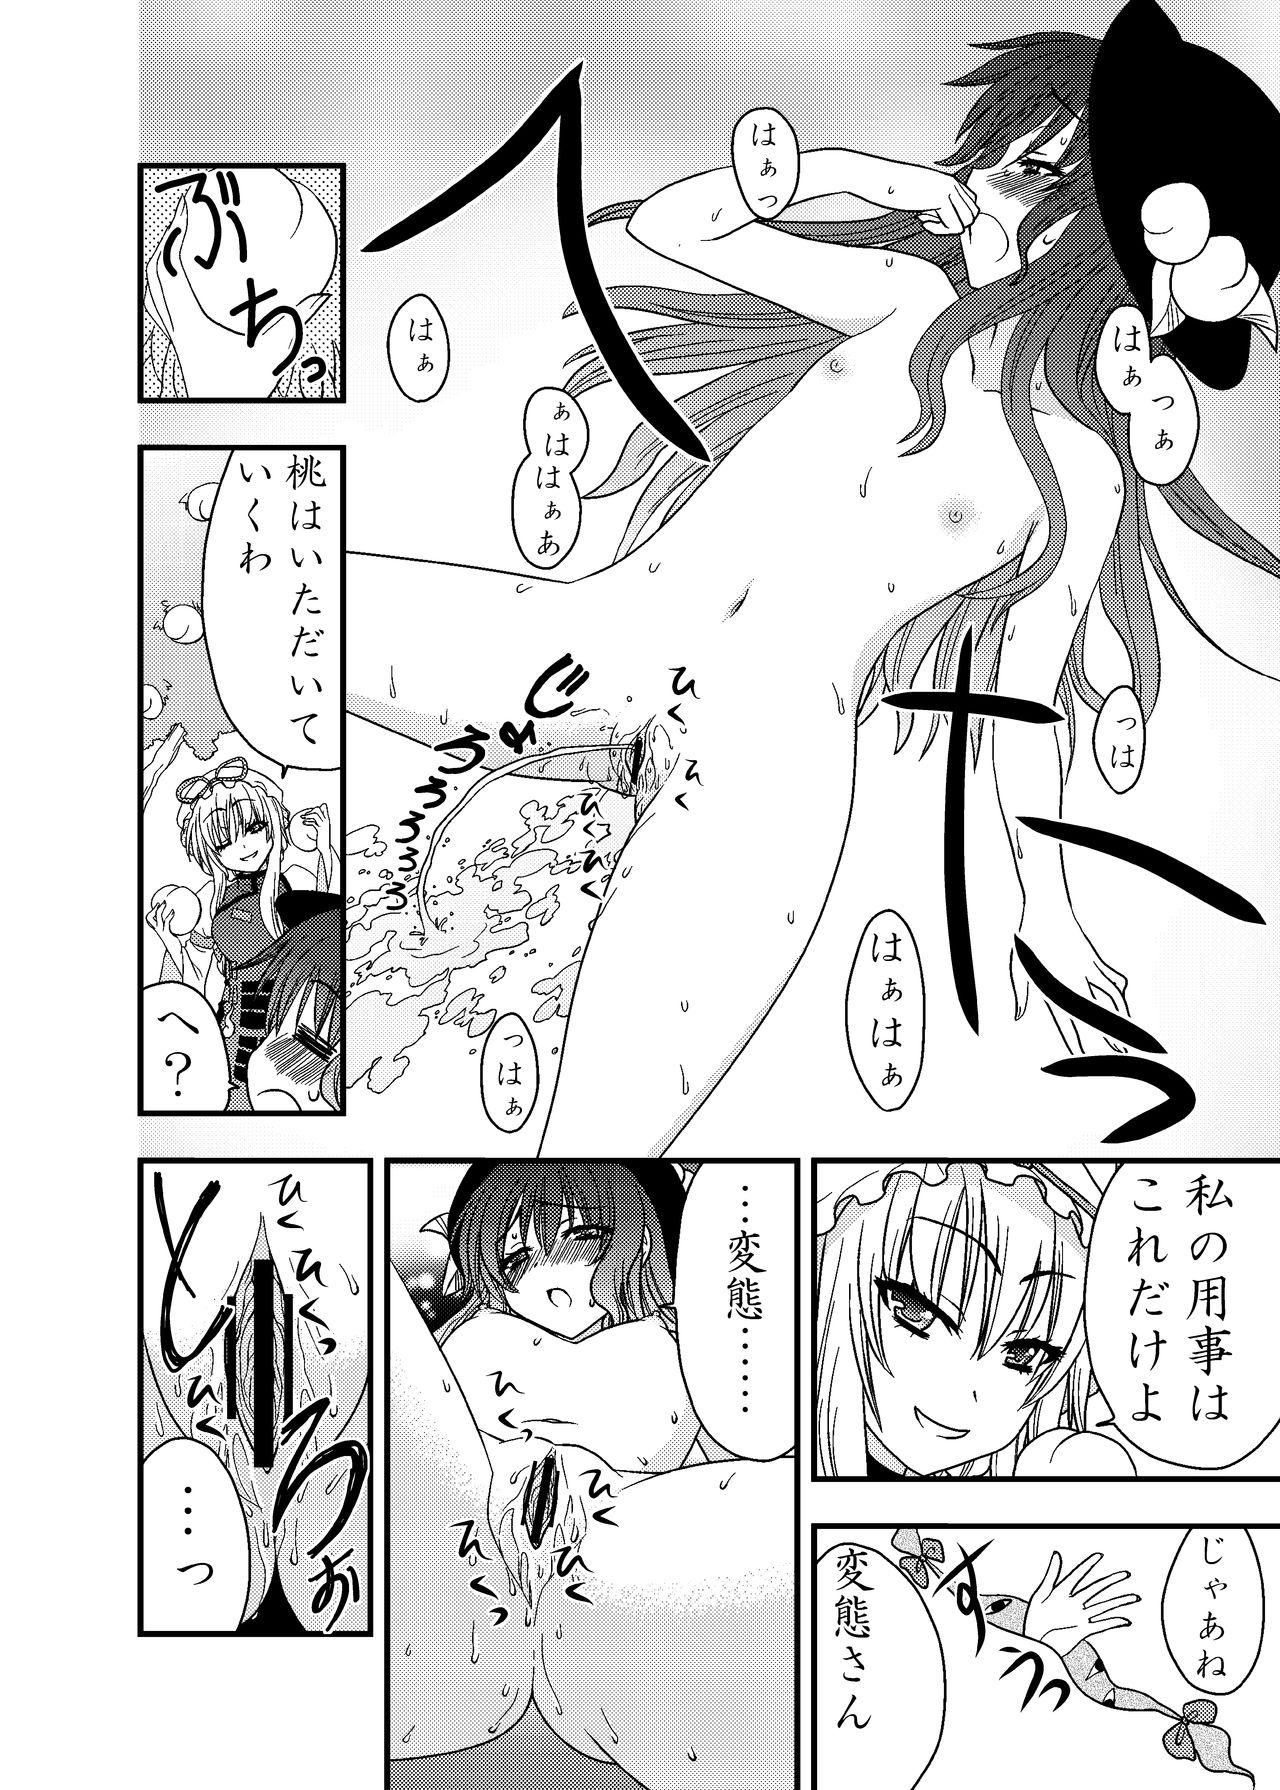 Tenko Hitori de Dekinai mon! 16